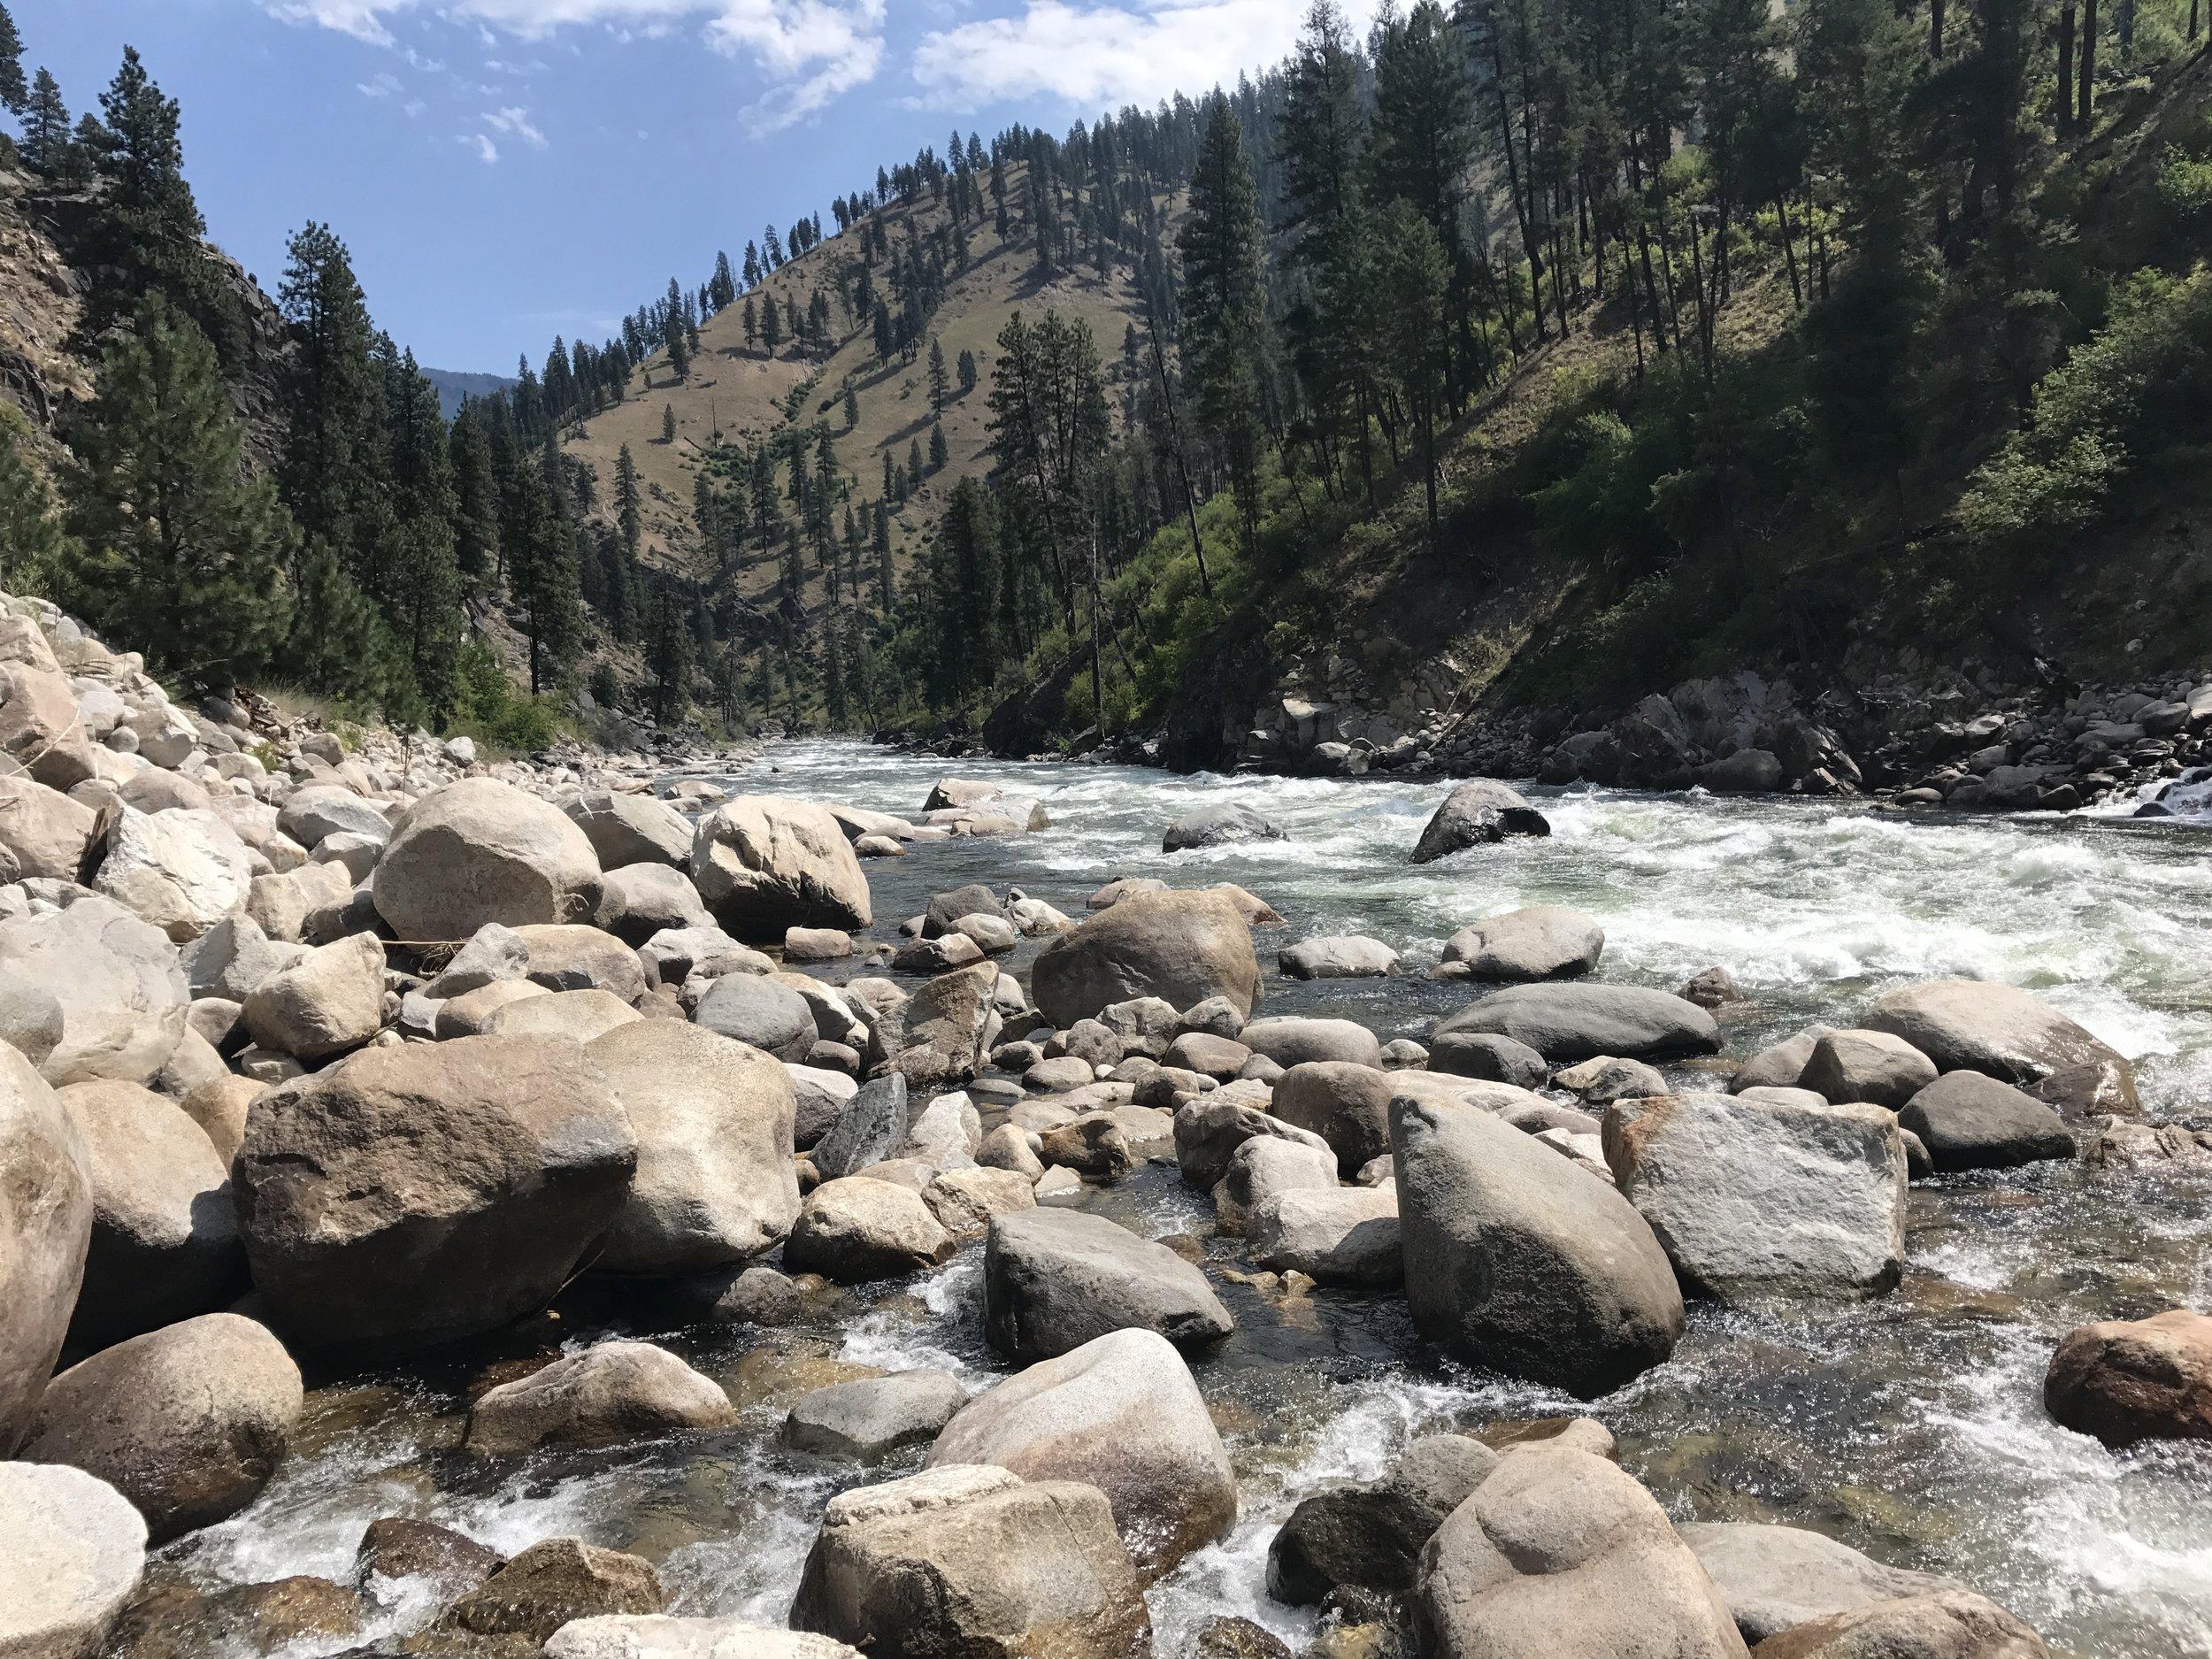 South Fork Salmon River  @Nate Ostis